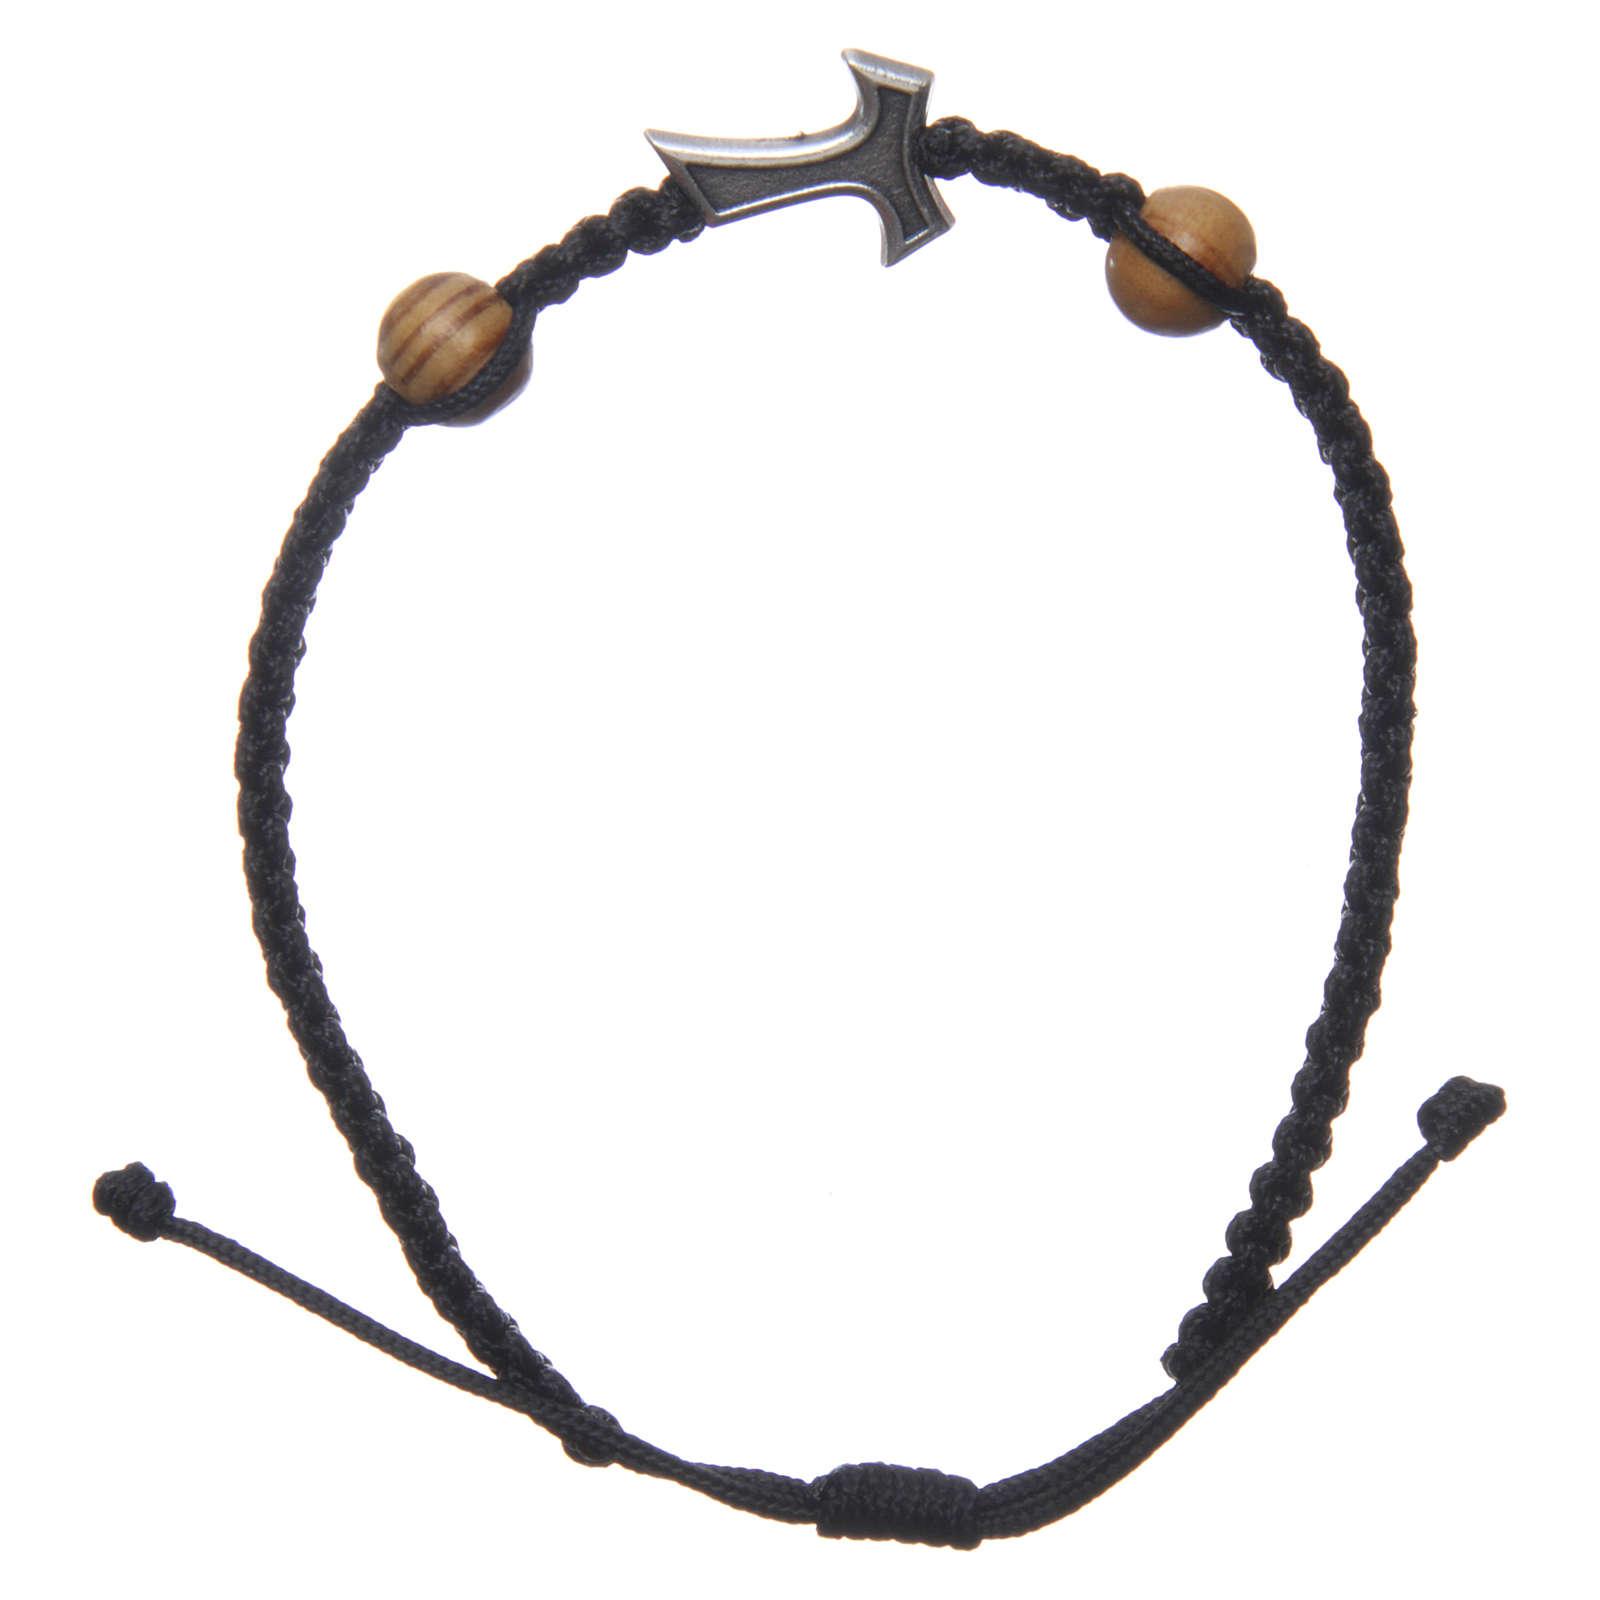 Pulsera Medjugorje cuerda negra cruz Tau 2 granos 4